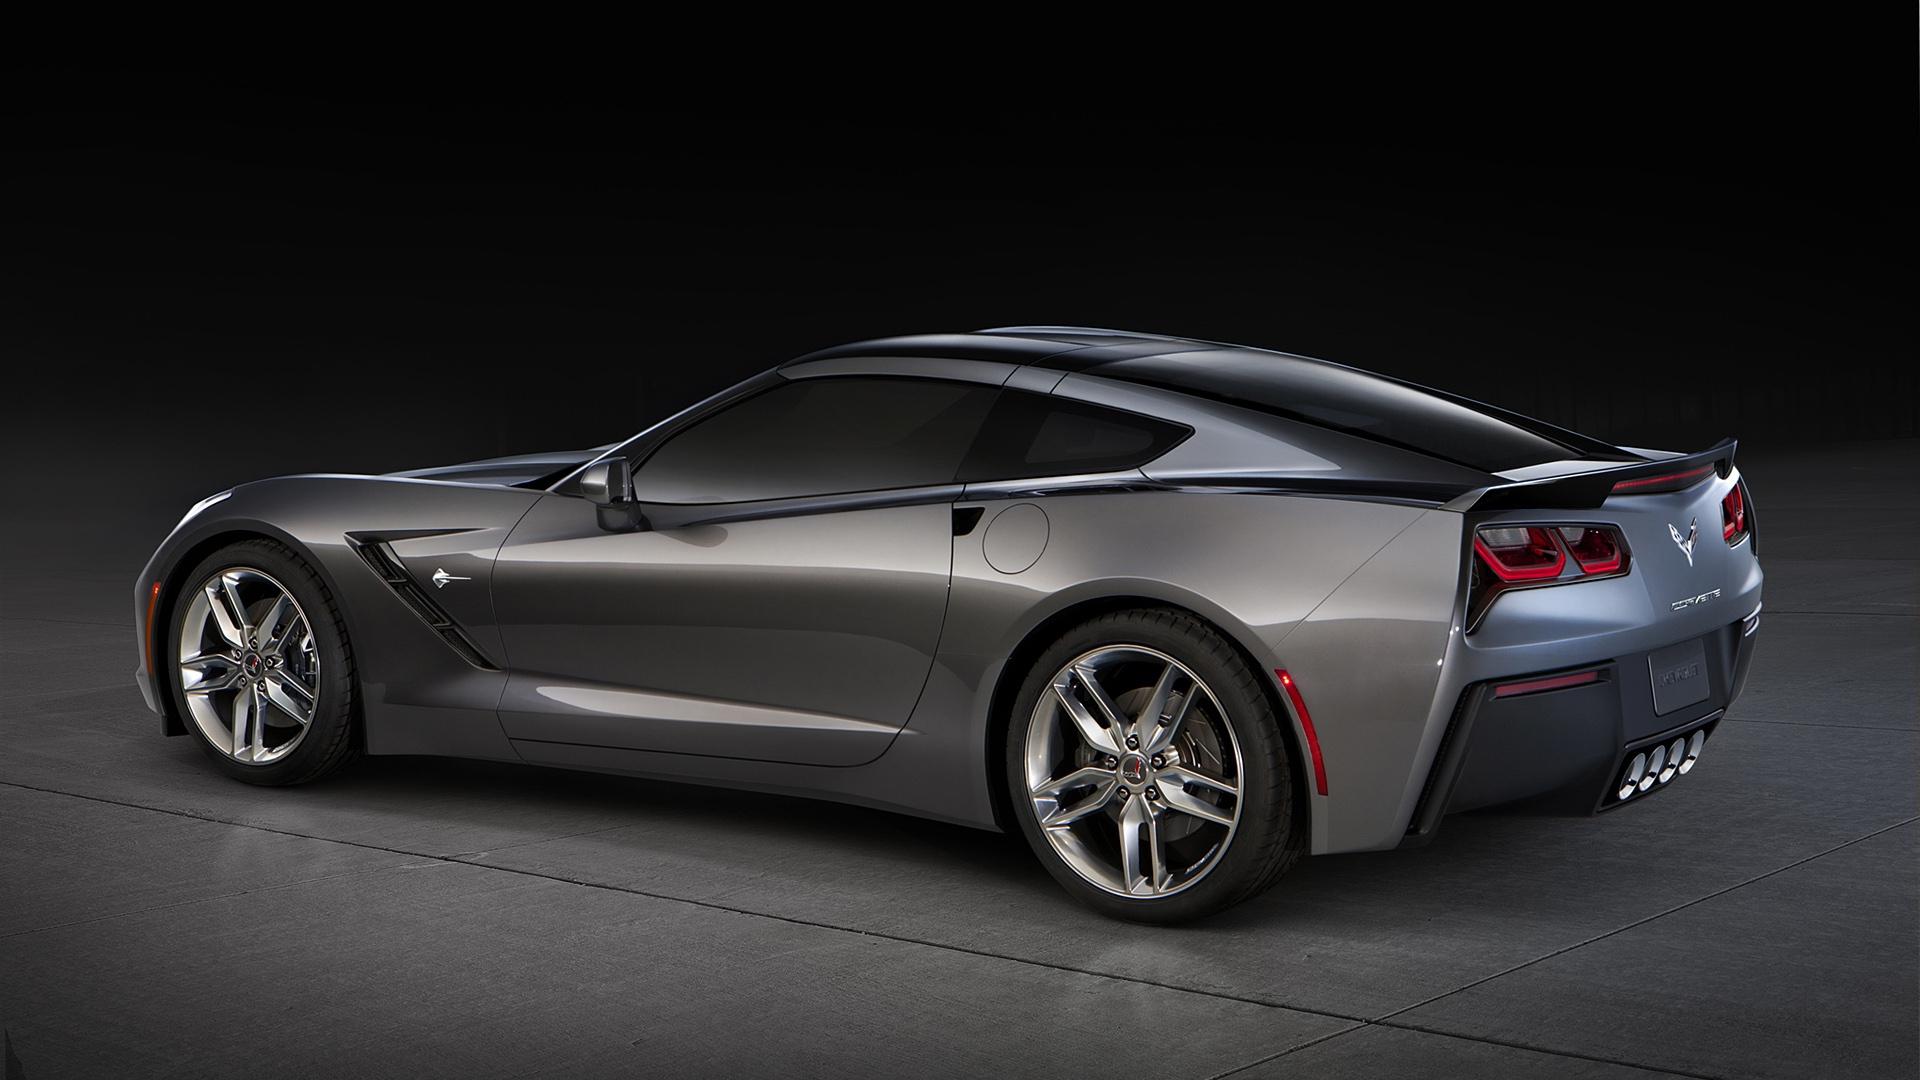 Chevrolet Corvette Wallpapers Hd